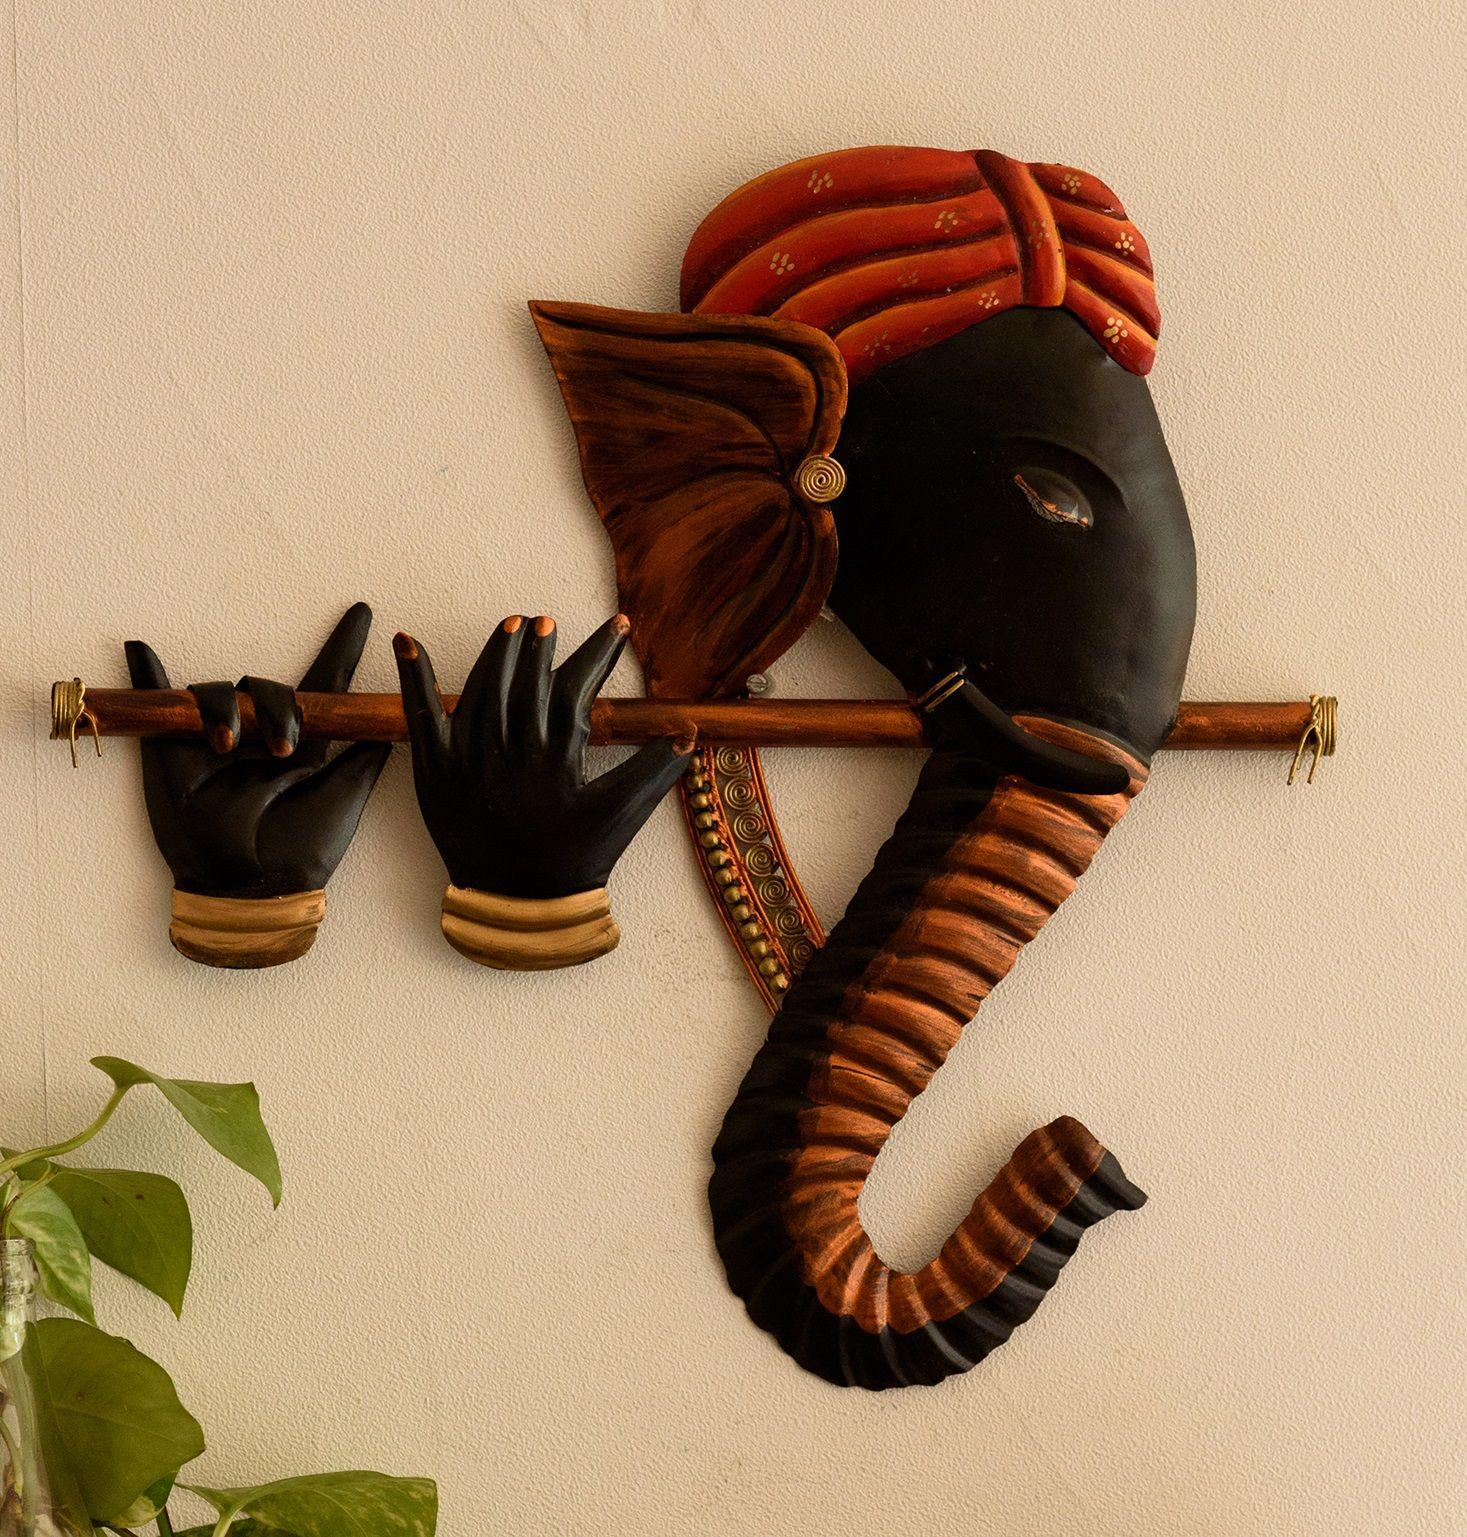 Wrought Iron Bansuri Ganesha Wall Hanging Indian Home Decor